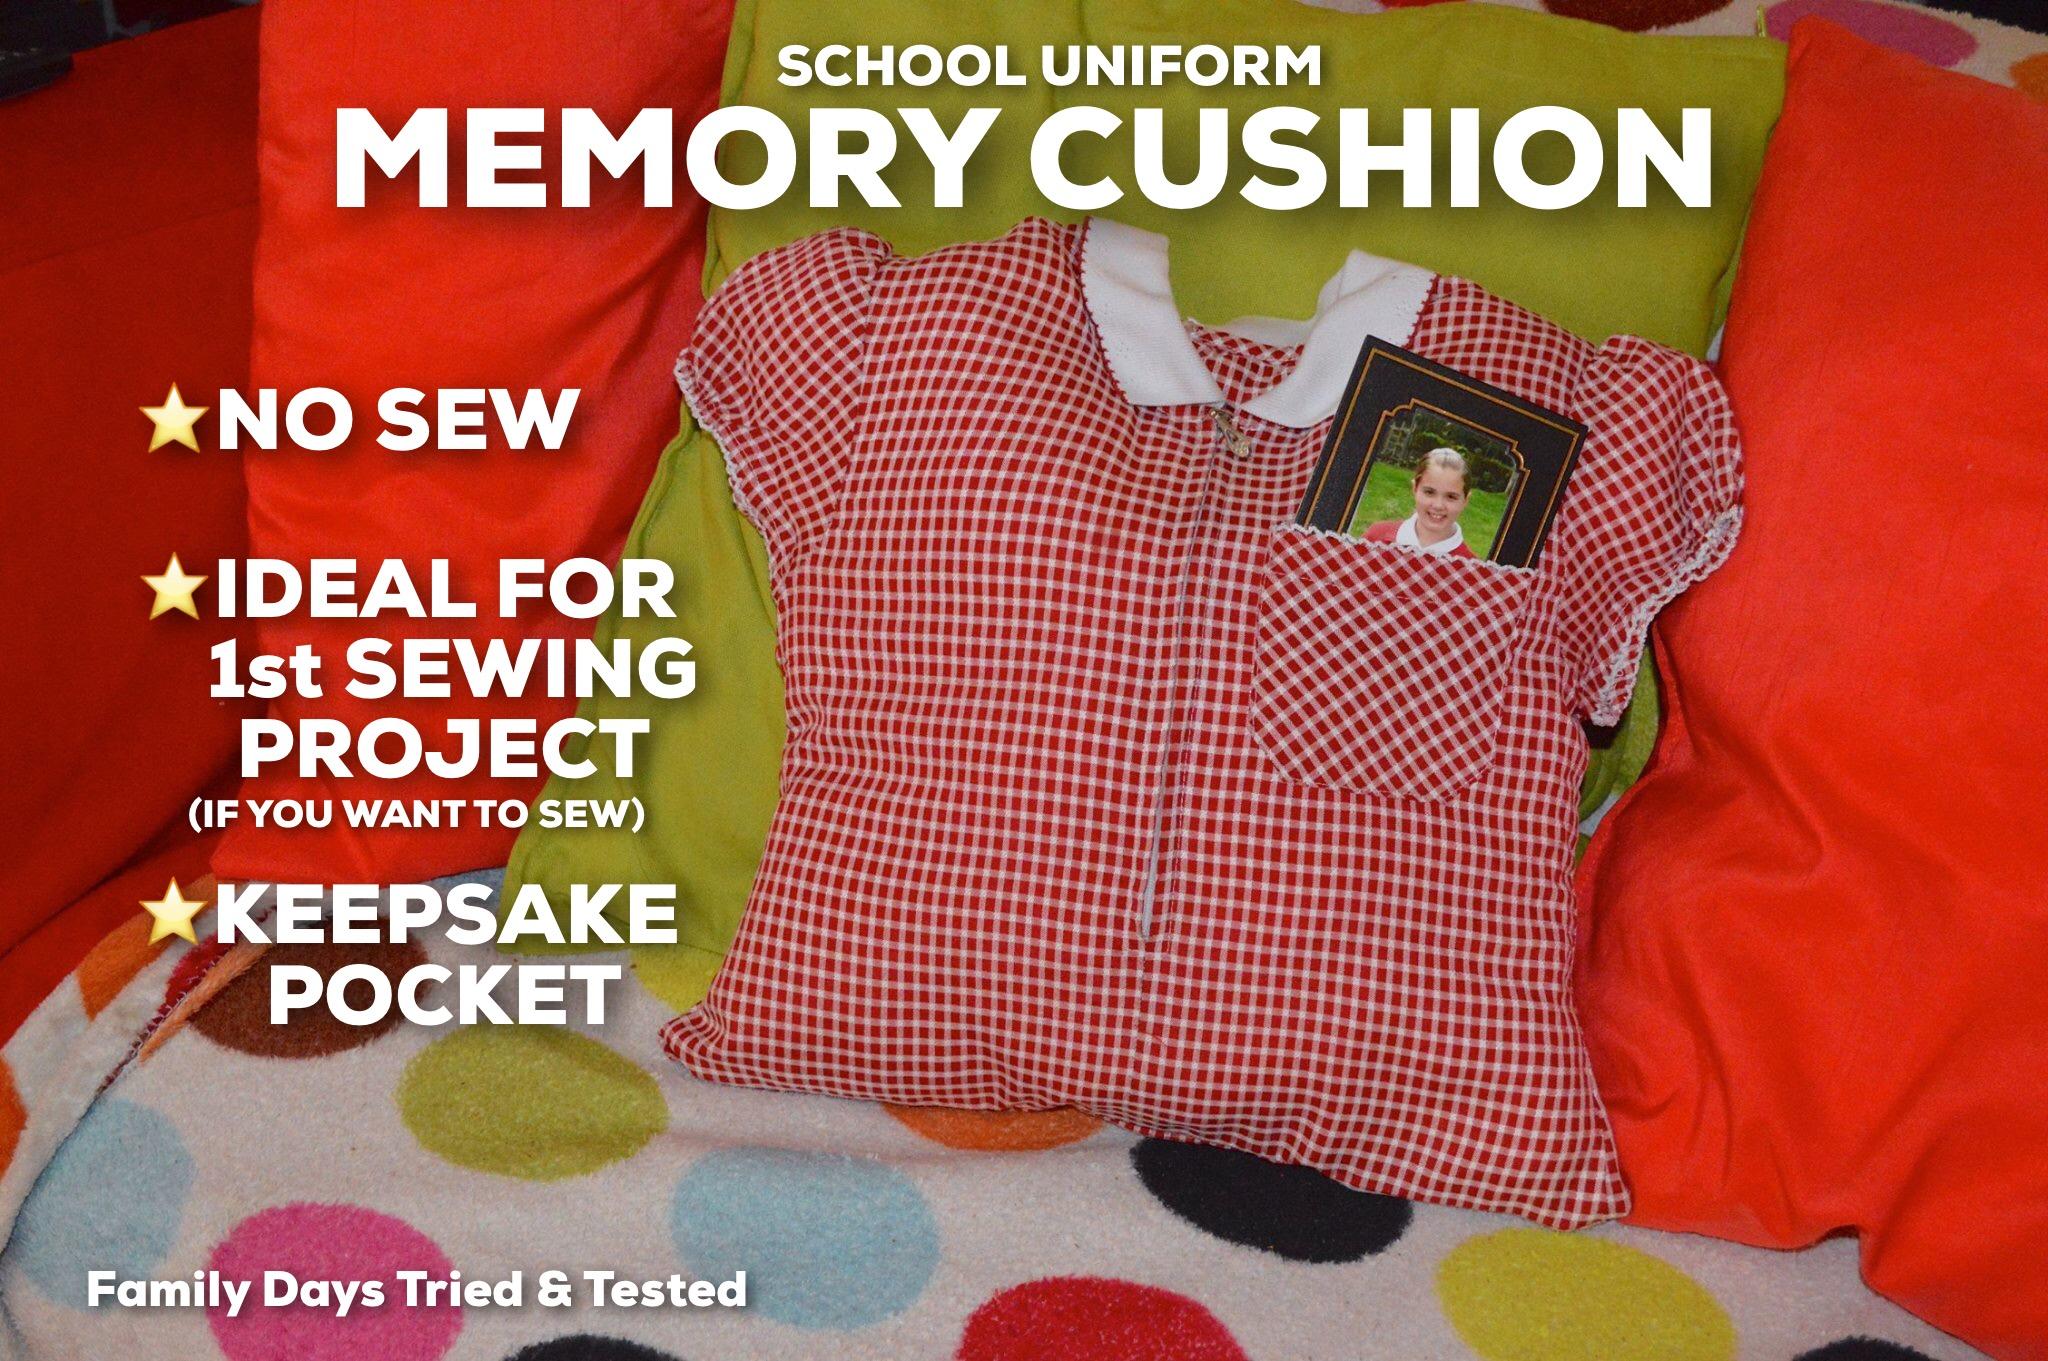 School Uniform Memory Cushion